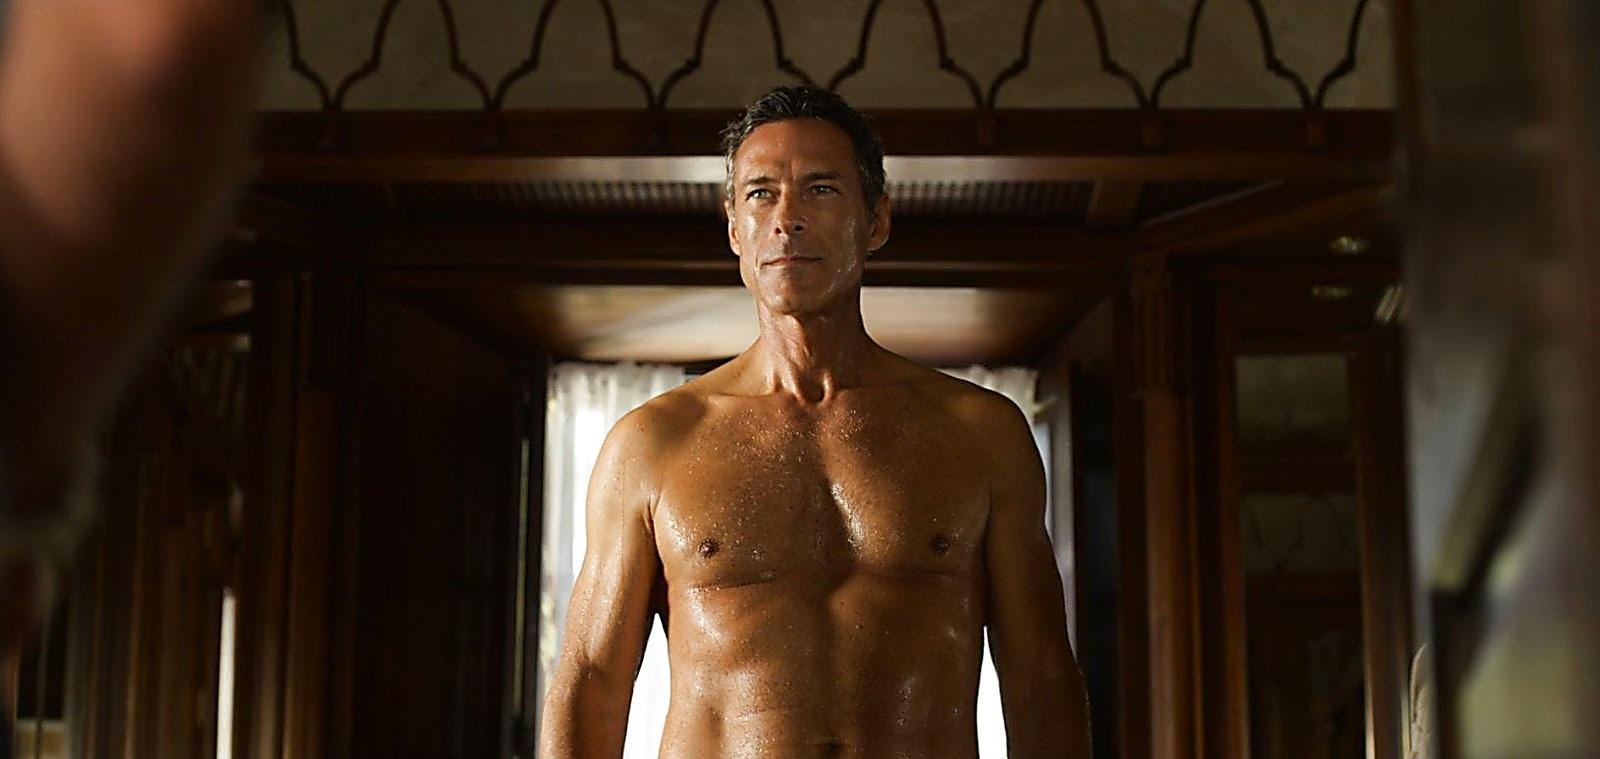 Paulo Pires sexy shirtless scene May 16, 2020, 1pm